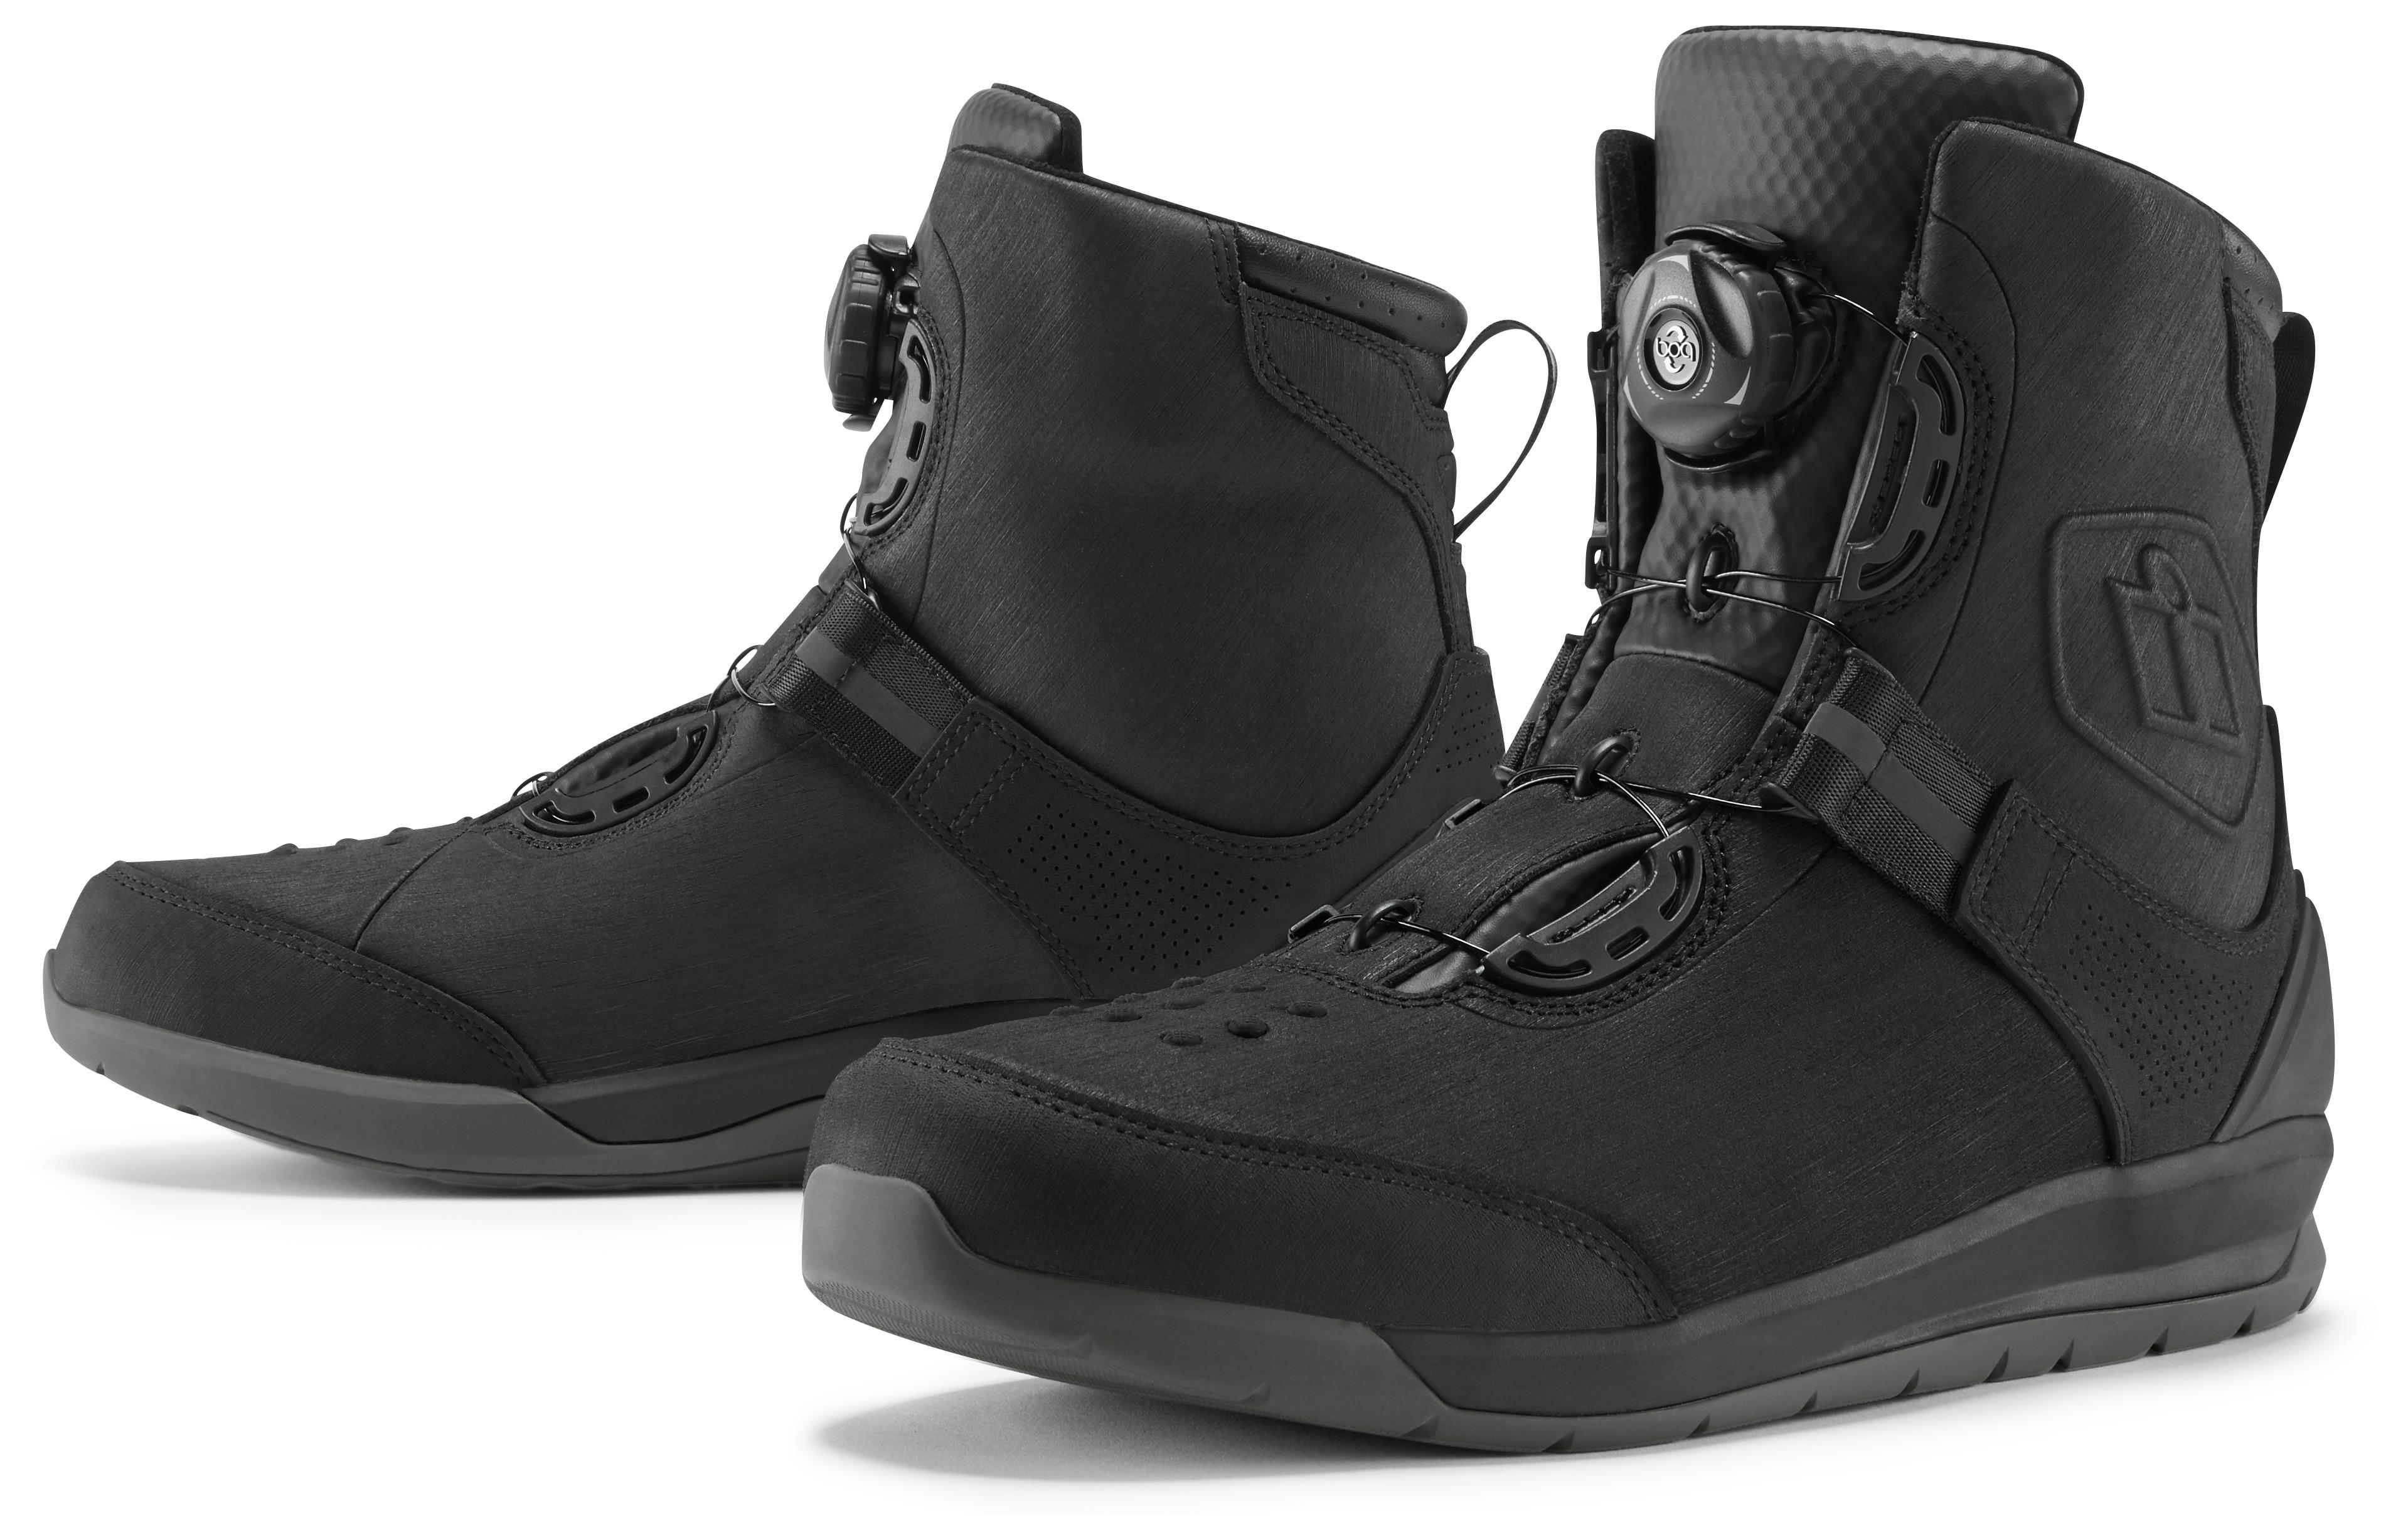 Icon Patrol 2 Boots - RevZilla 9705dbc607